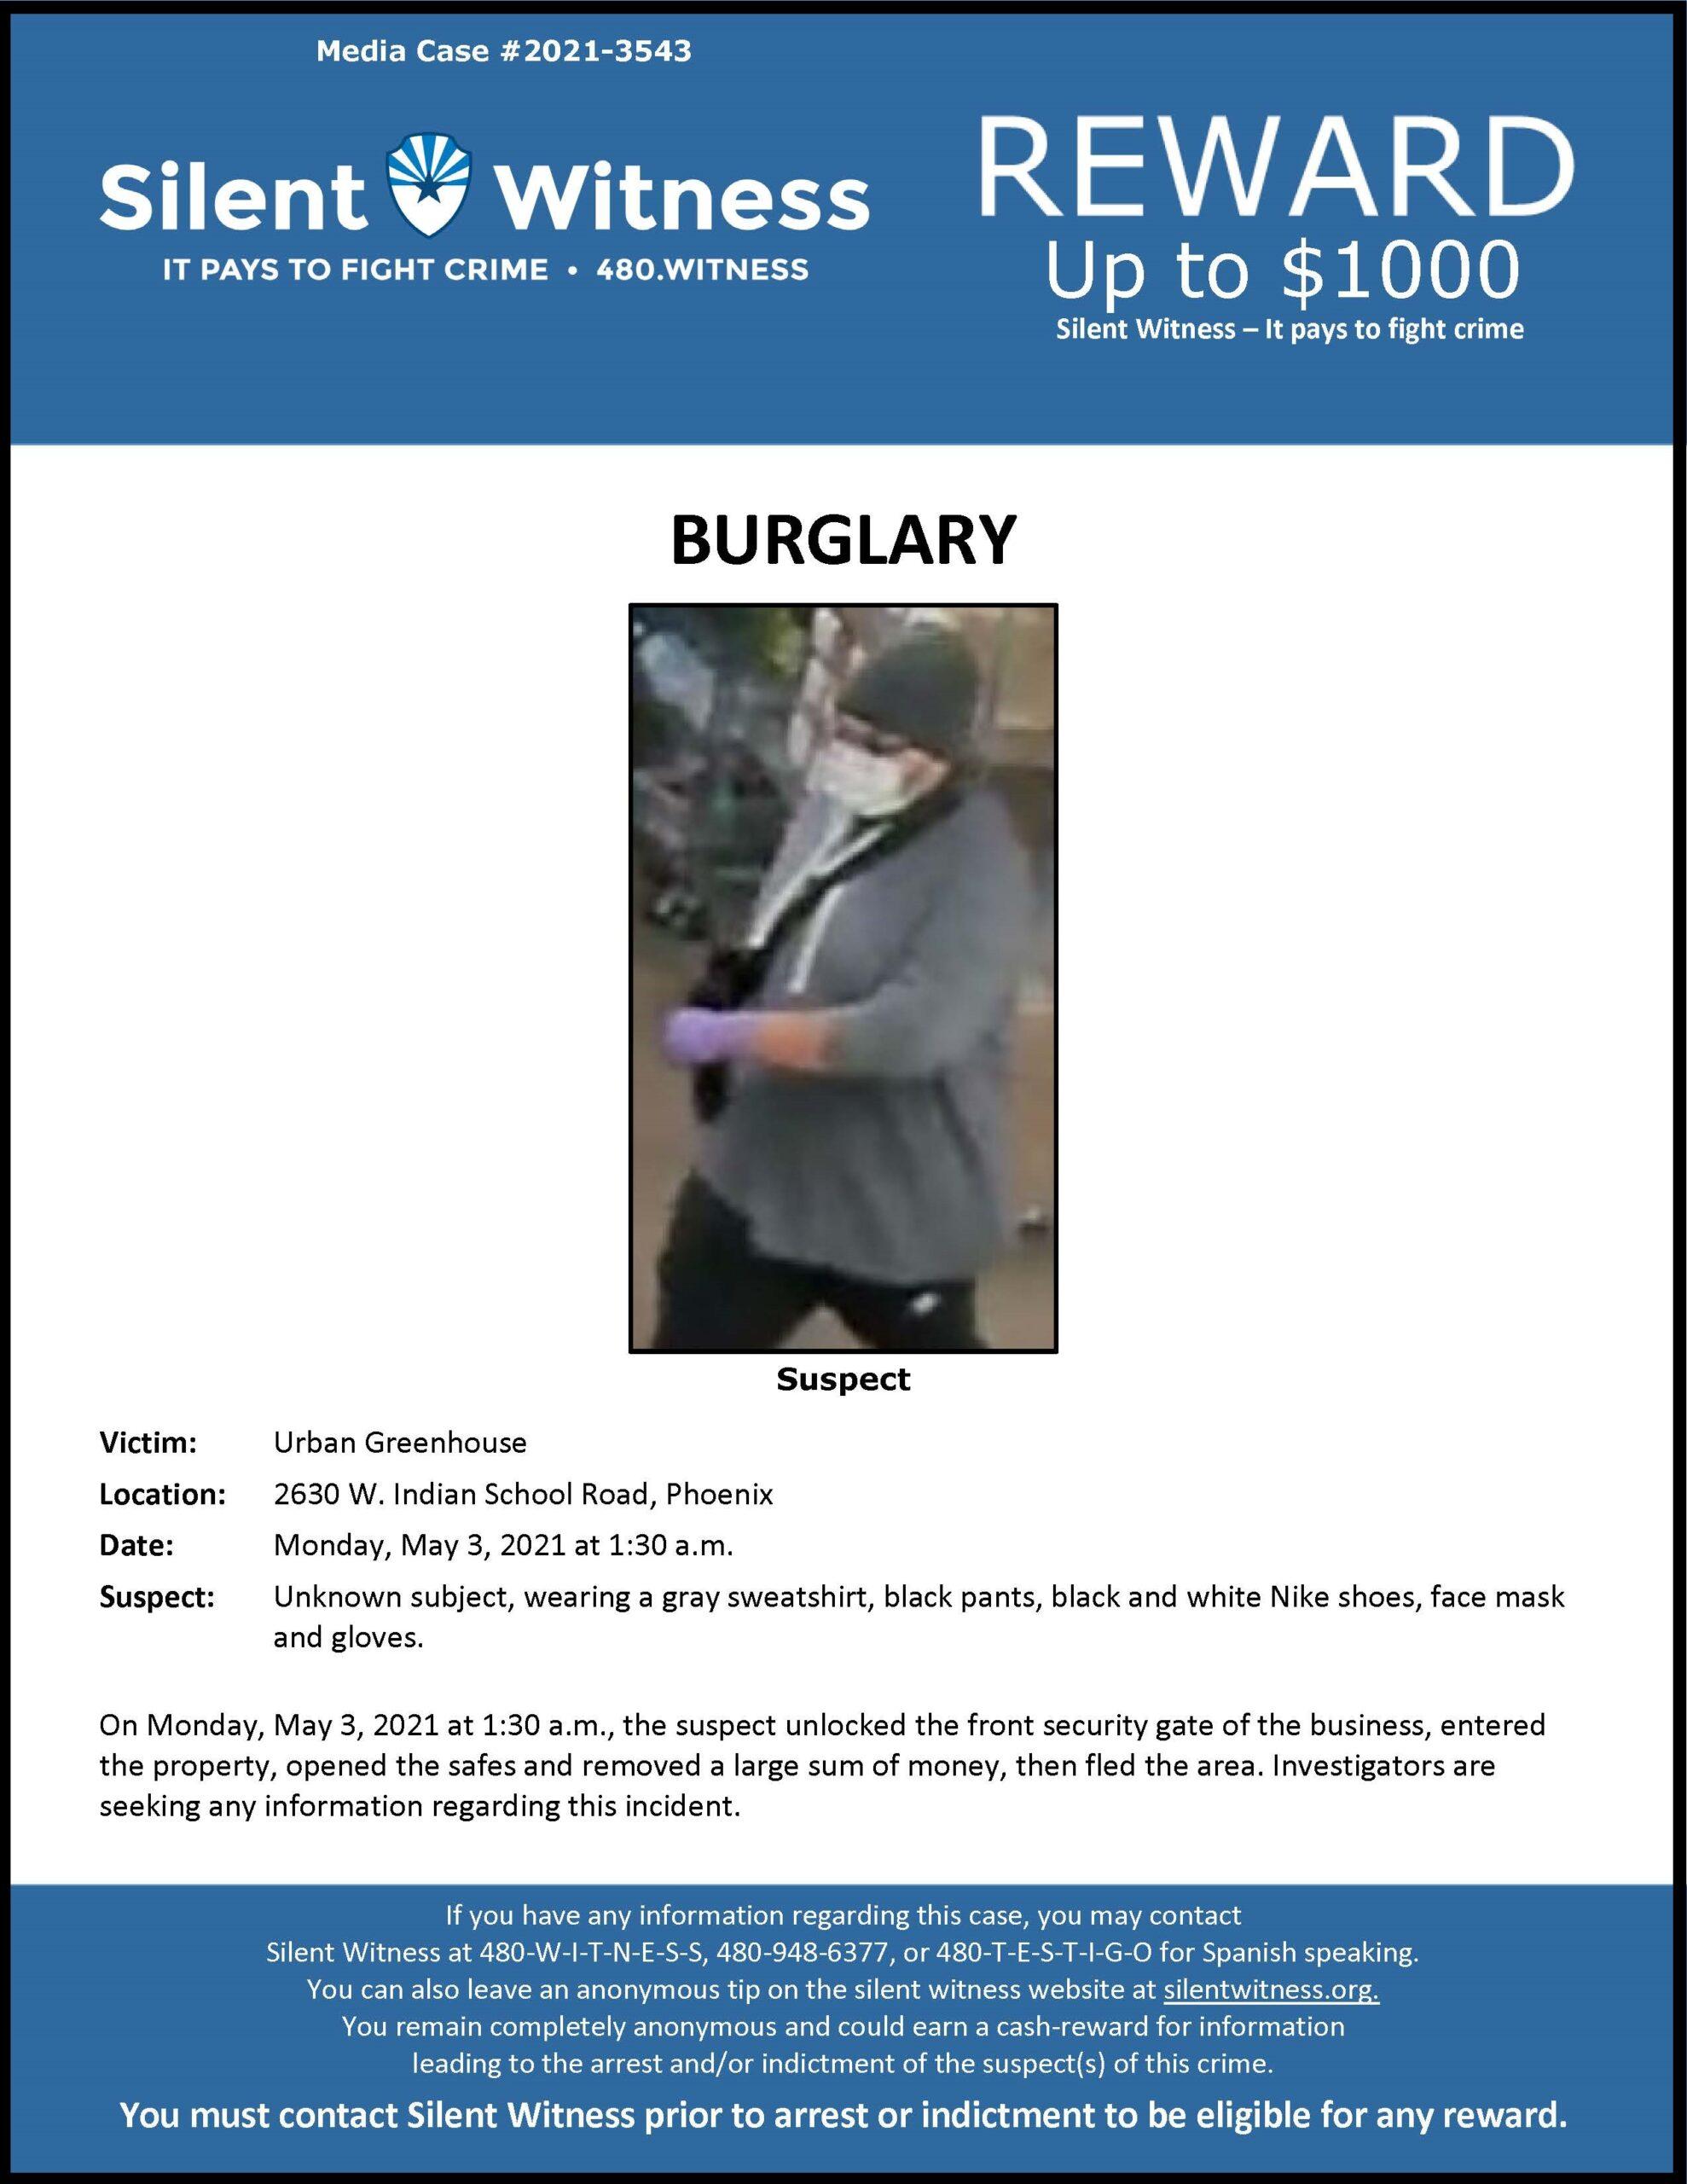 Burglary / Urban Greenhouse / 2630 W. Indian School Rd., Phoenix